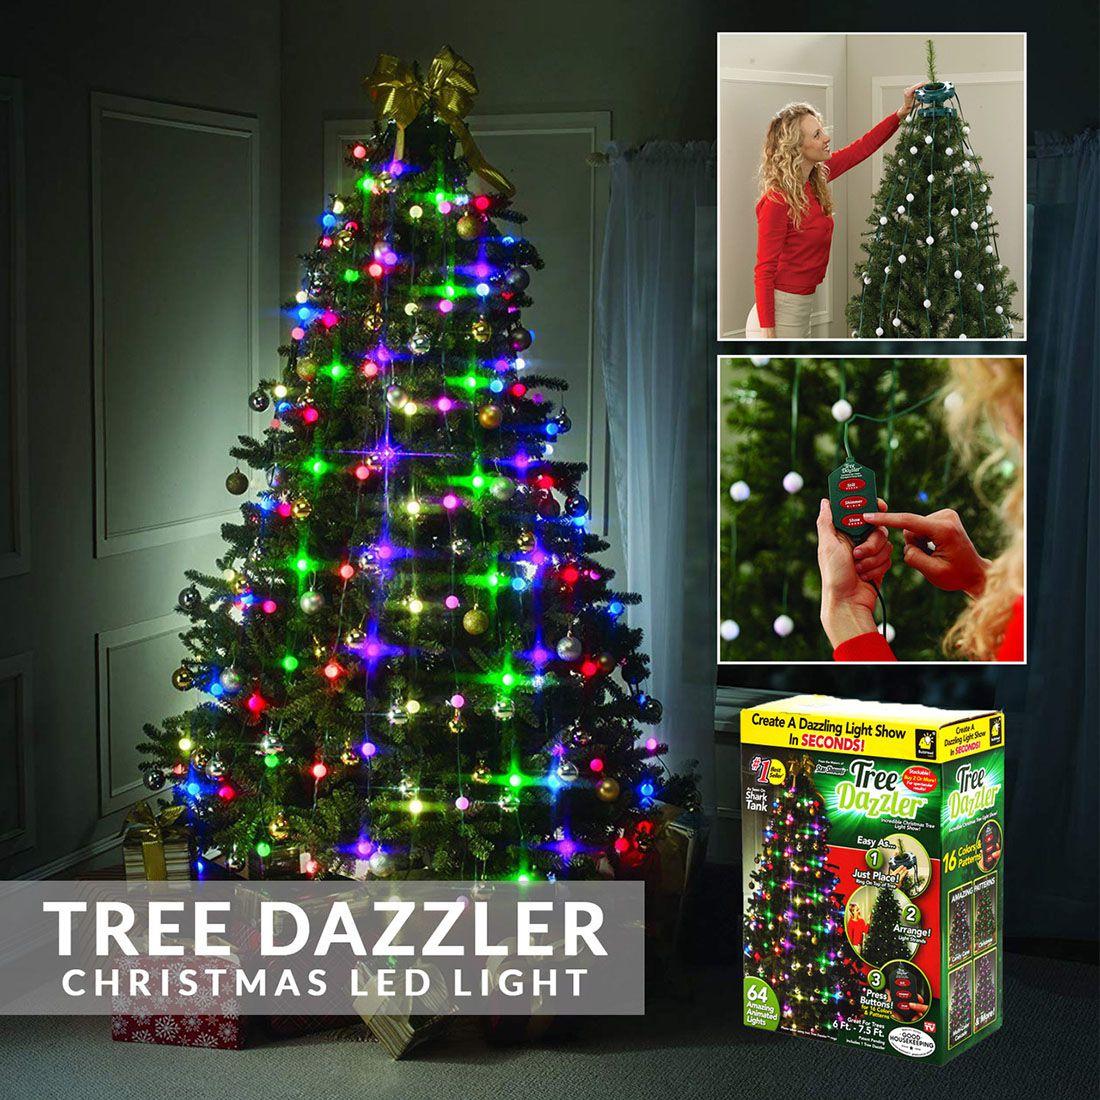 Pisca Pisca RGB Bola 16 Funcoes 48 Leds Natalino Arvore de Natal Tree Dazzler